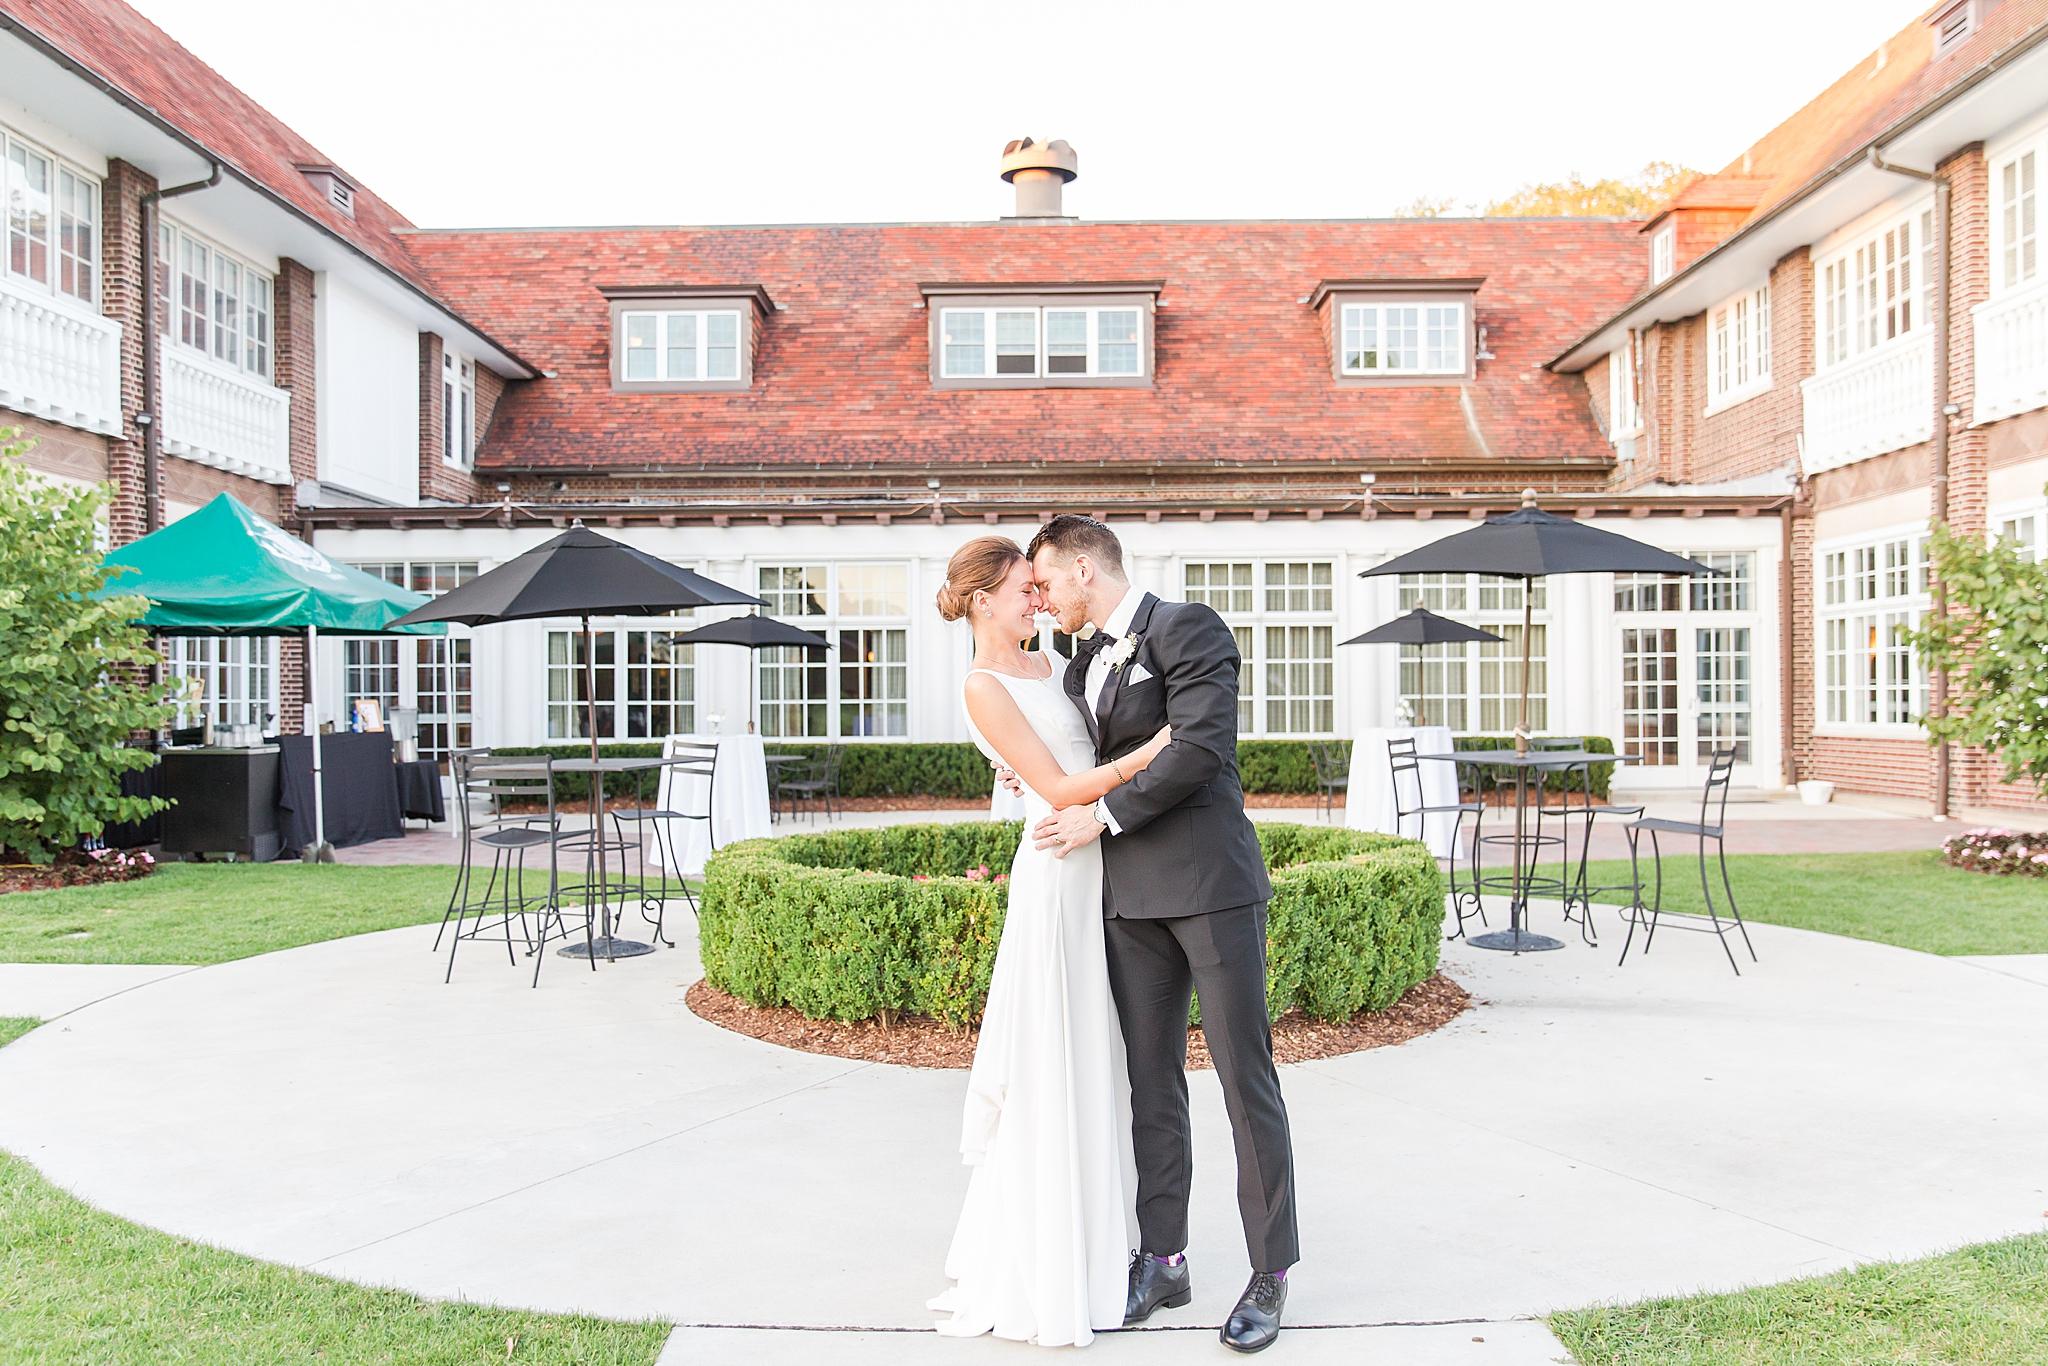 detroit-wedding-photographer-grosse-pointe-academy-chapel-detroit-golf-club-wedding-carly-matt-by-courtney-carolyn-photography_0105.jpg